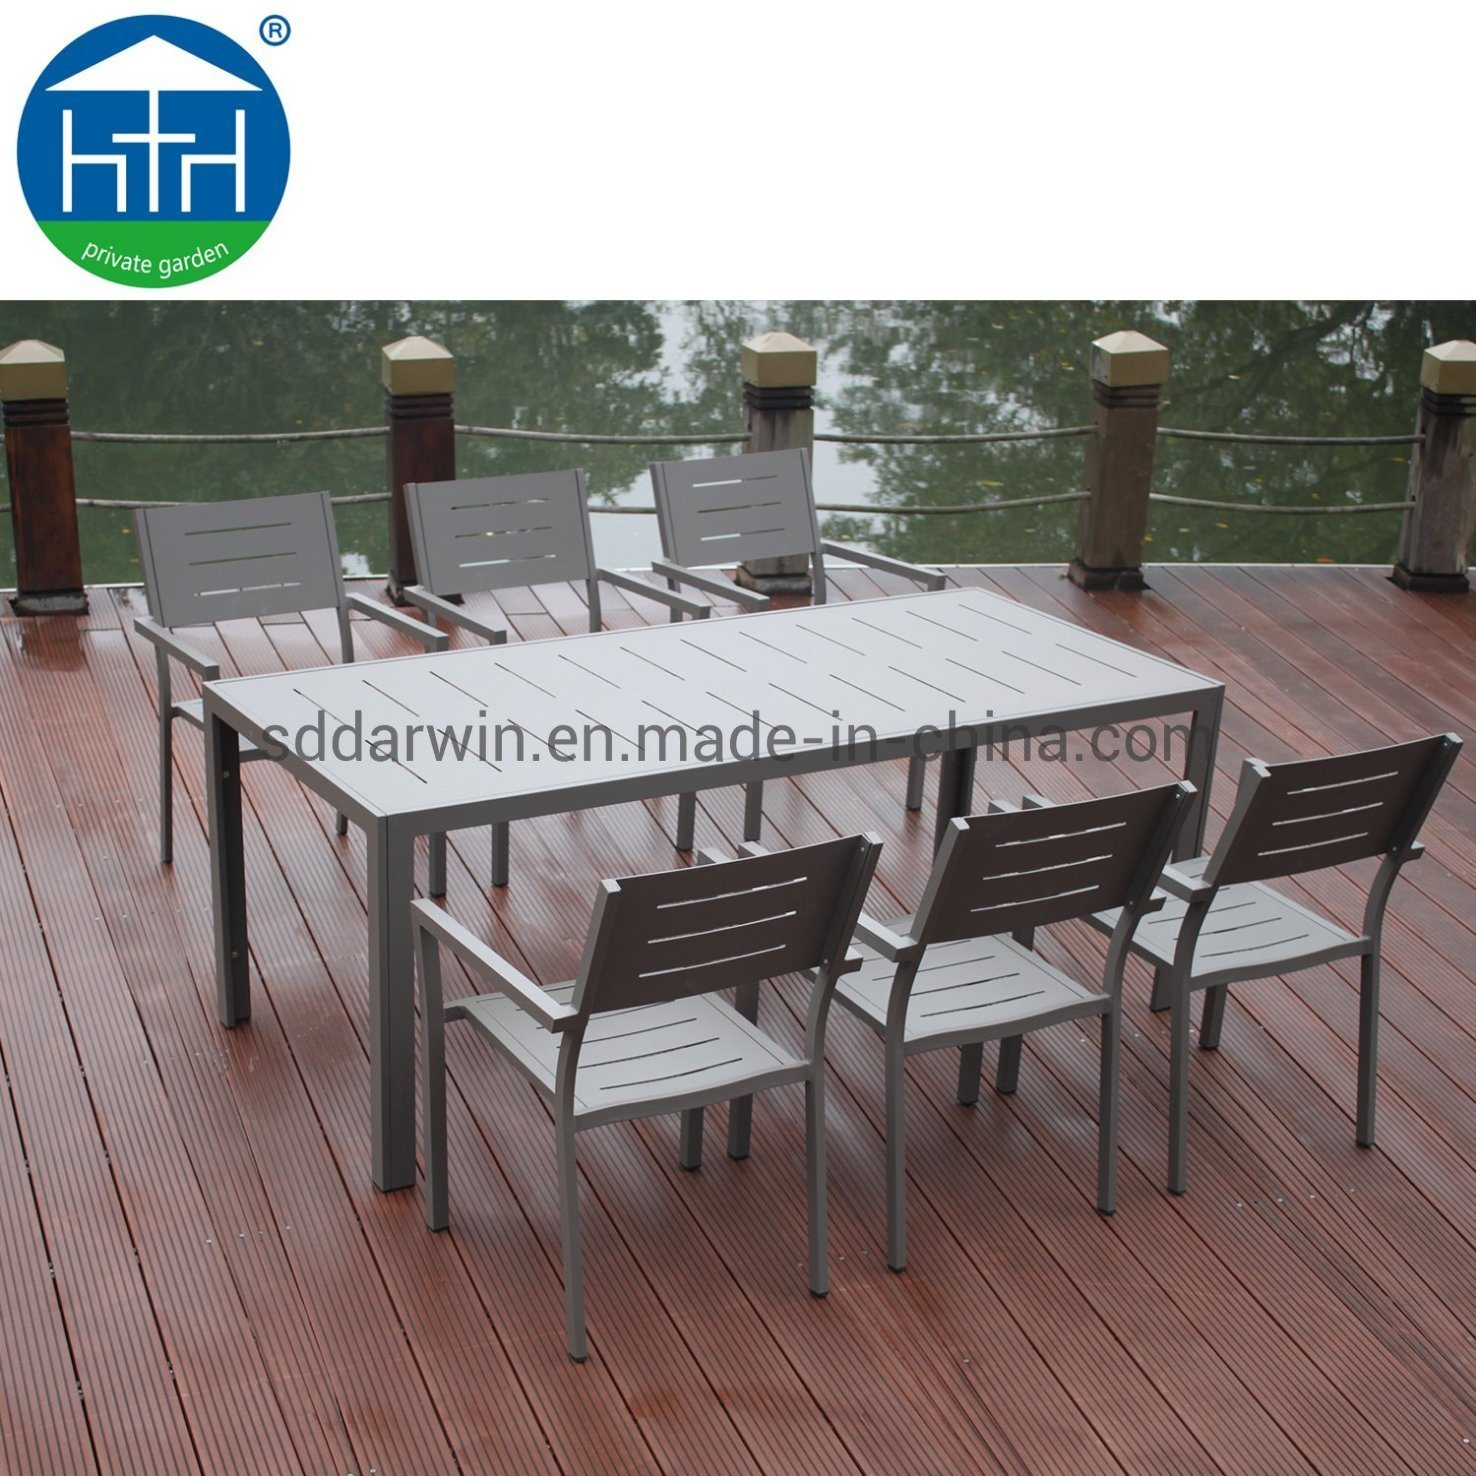 Super Hot Item Hot Selling Polywood Table And Park Bench For Garden Furniture Frankydiablos Diy Chair Ideas Frankydiabloscom